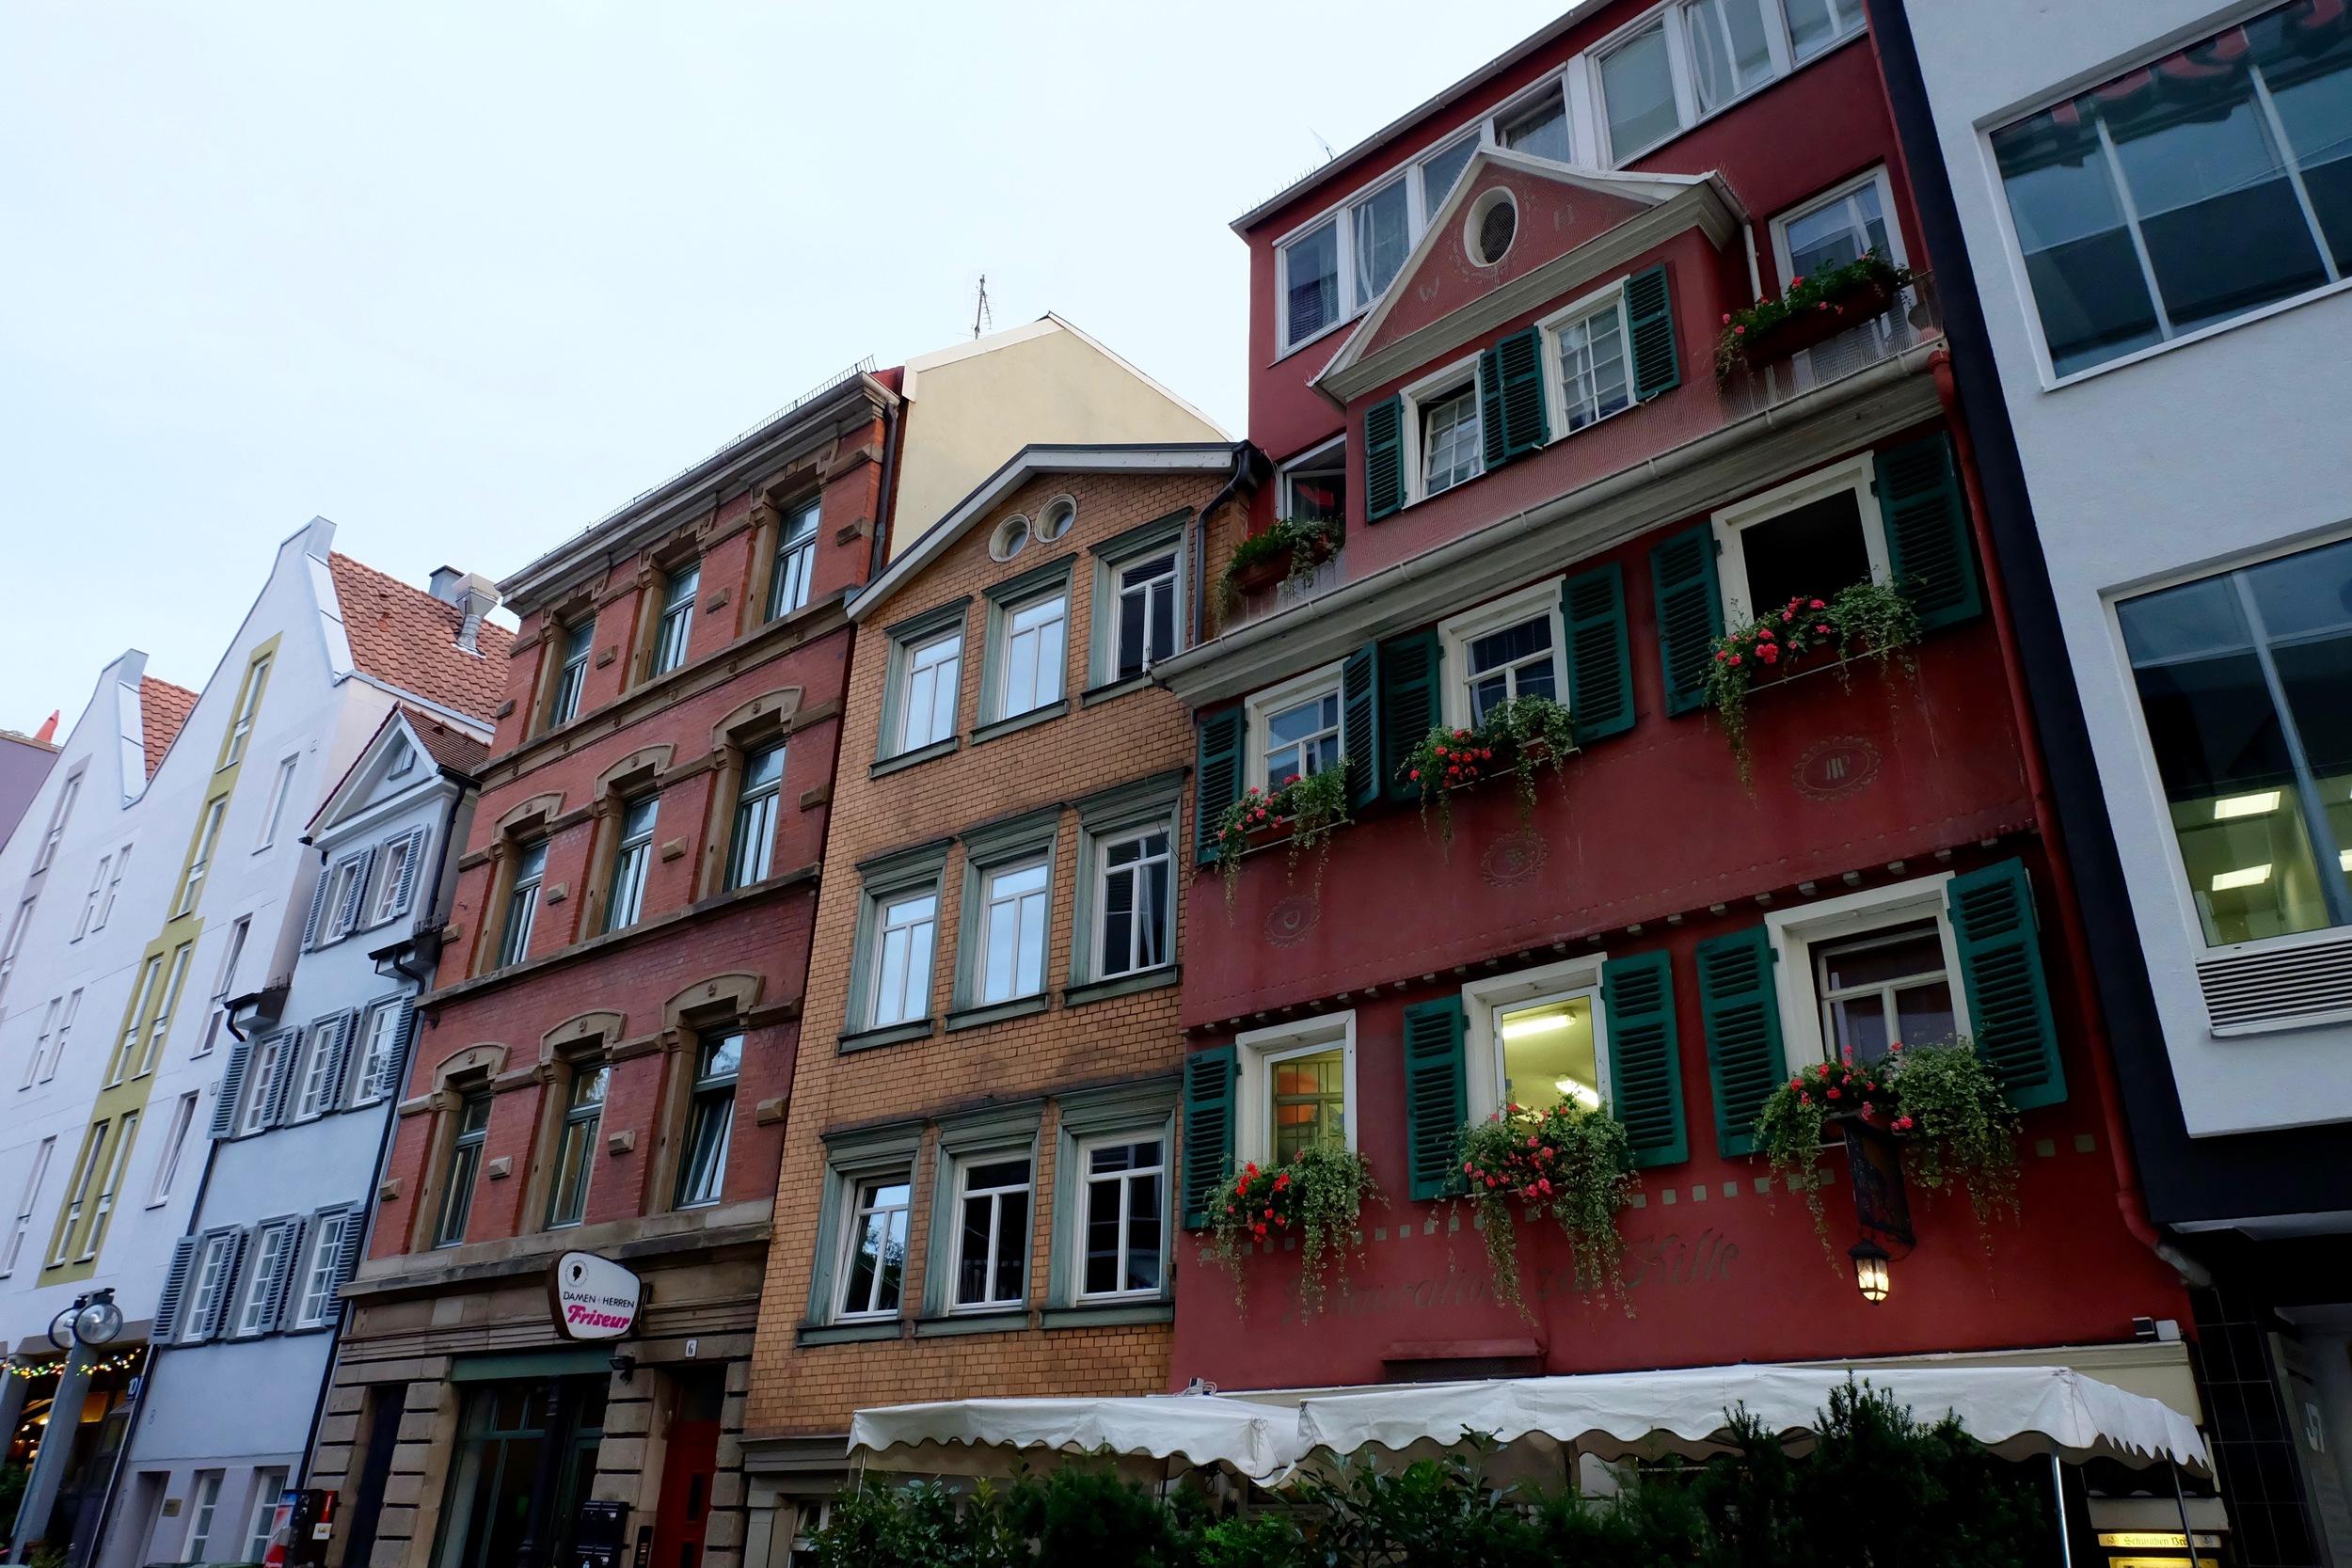 Weinstube zur Kiste , the red house in the row on  Kanalstraße